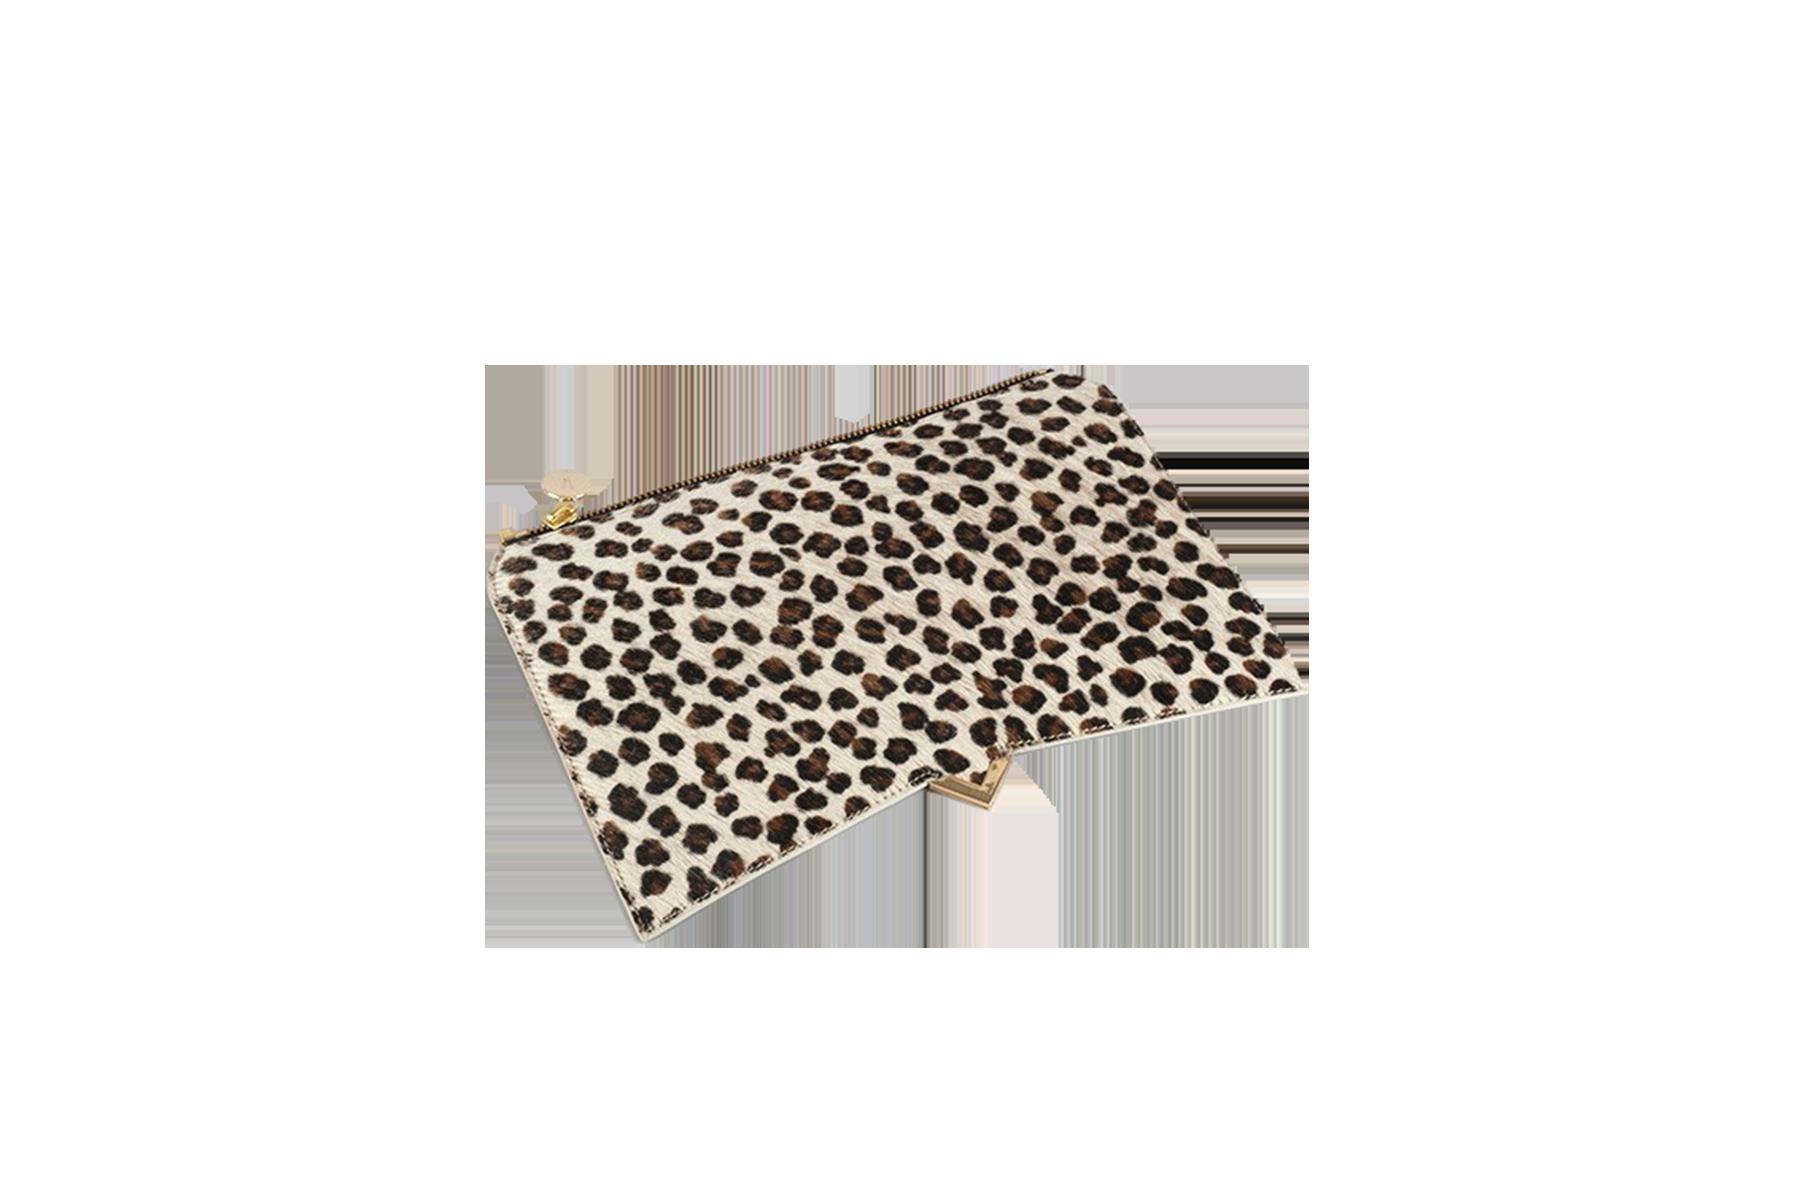 Roma Rabat - Poils leopard2